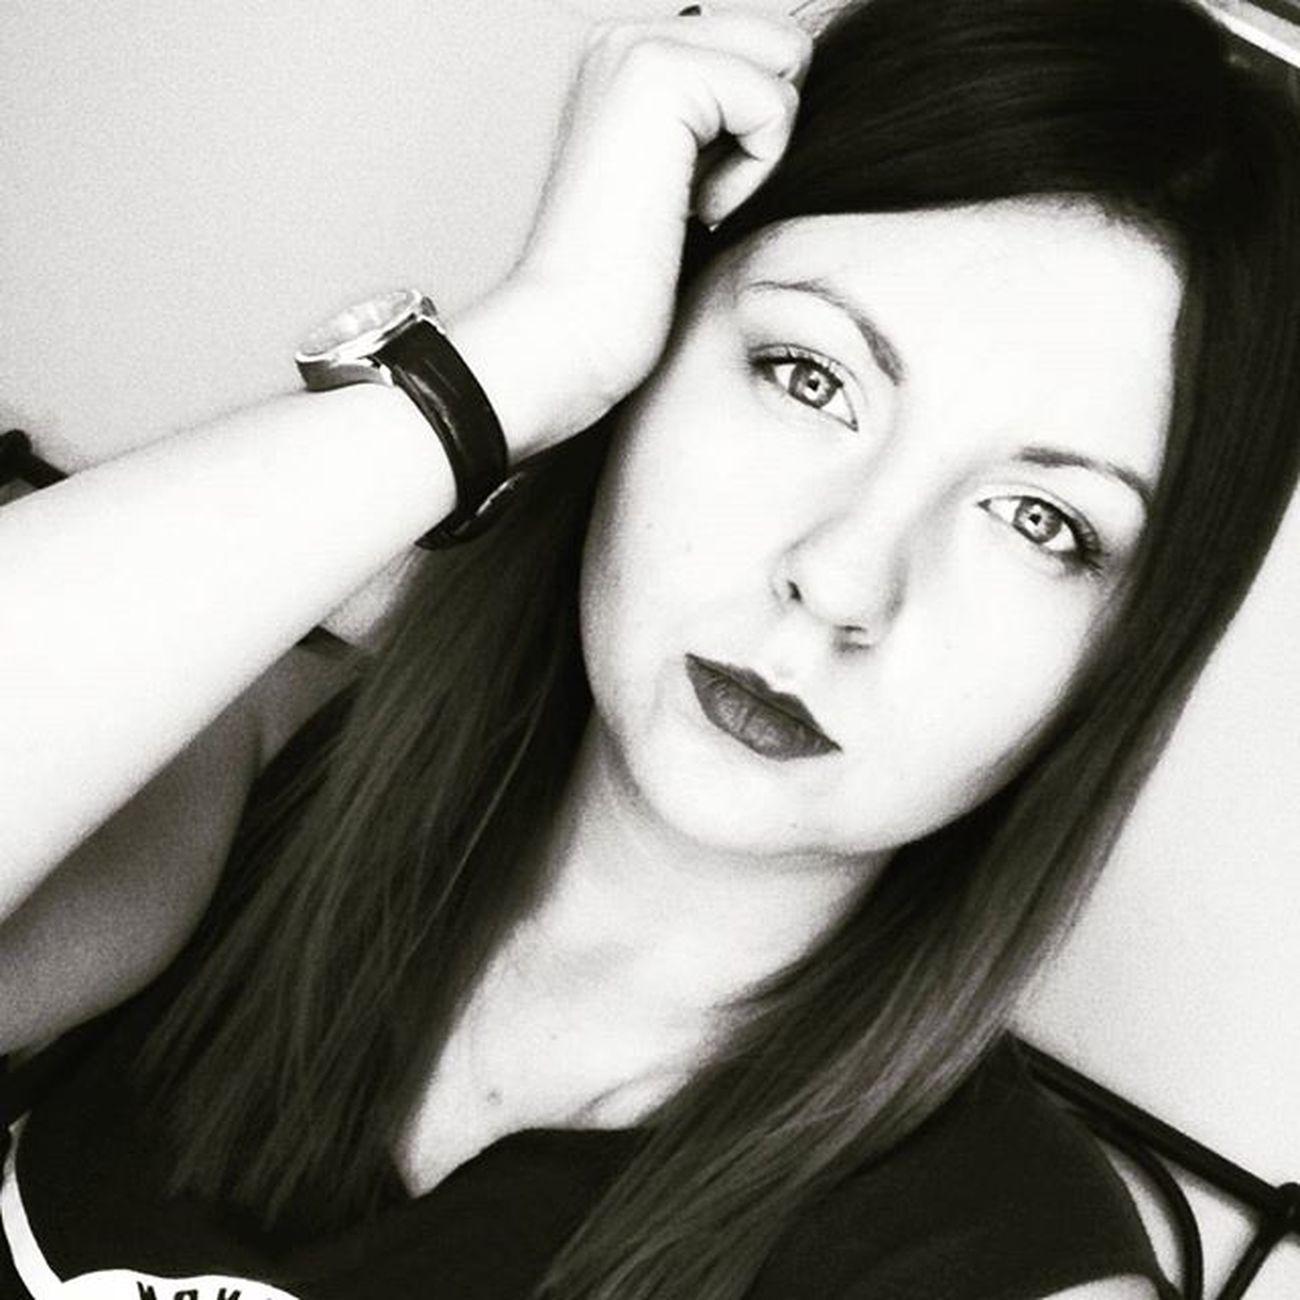 Goodevening  Goodnight Me Blackandwhite Makeup Ombre Polishgirlsdoitbetter Polskadziewczyna Polishgirl Thinking Likeforlike Lfl L4l Like4like Bestoftheday Picoftheday Photooftheday